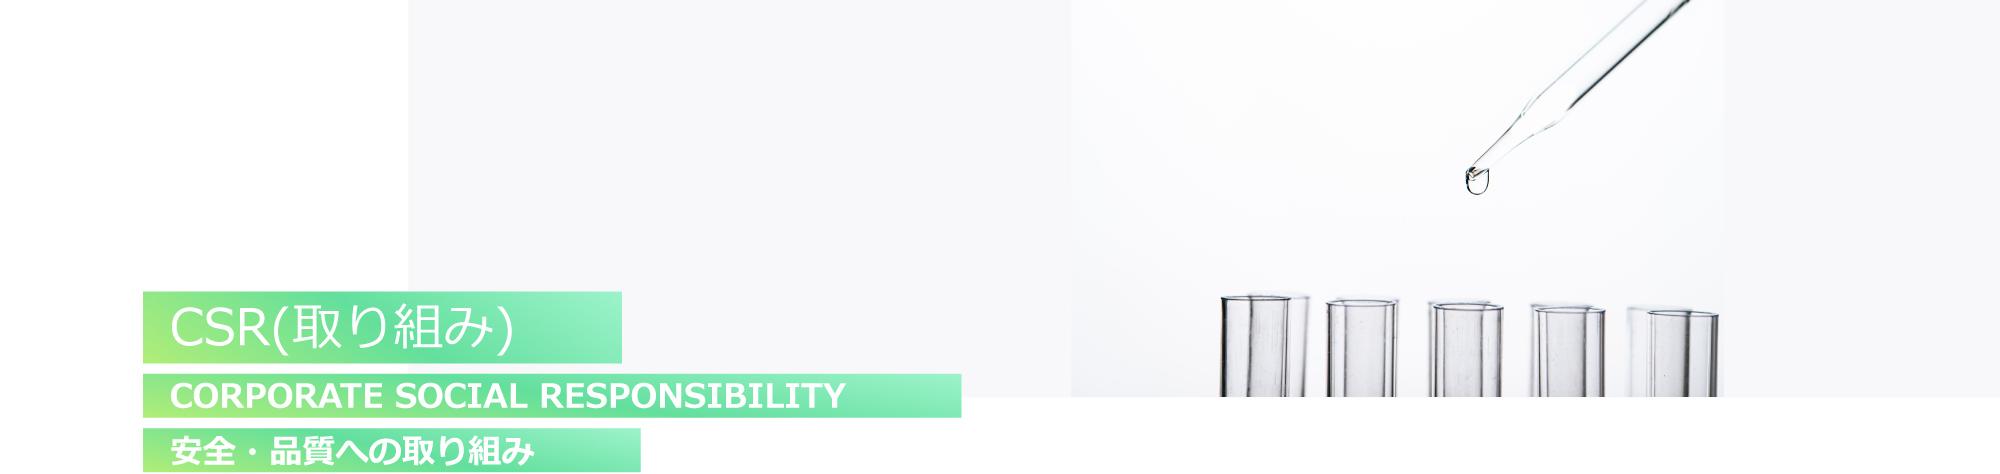 CSR _安全・品質への取り組み